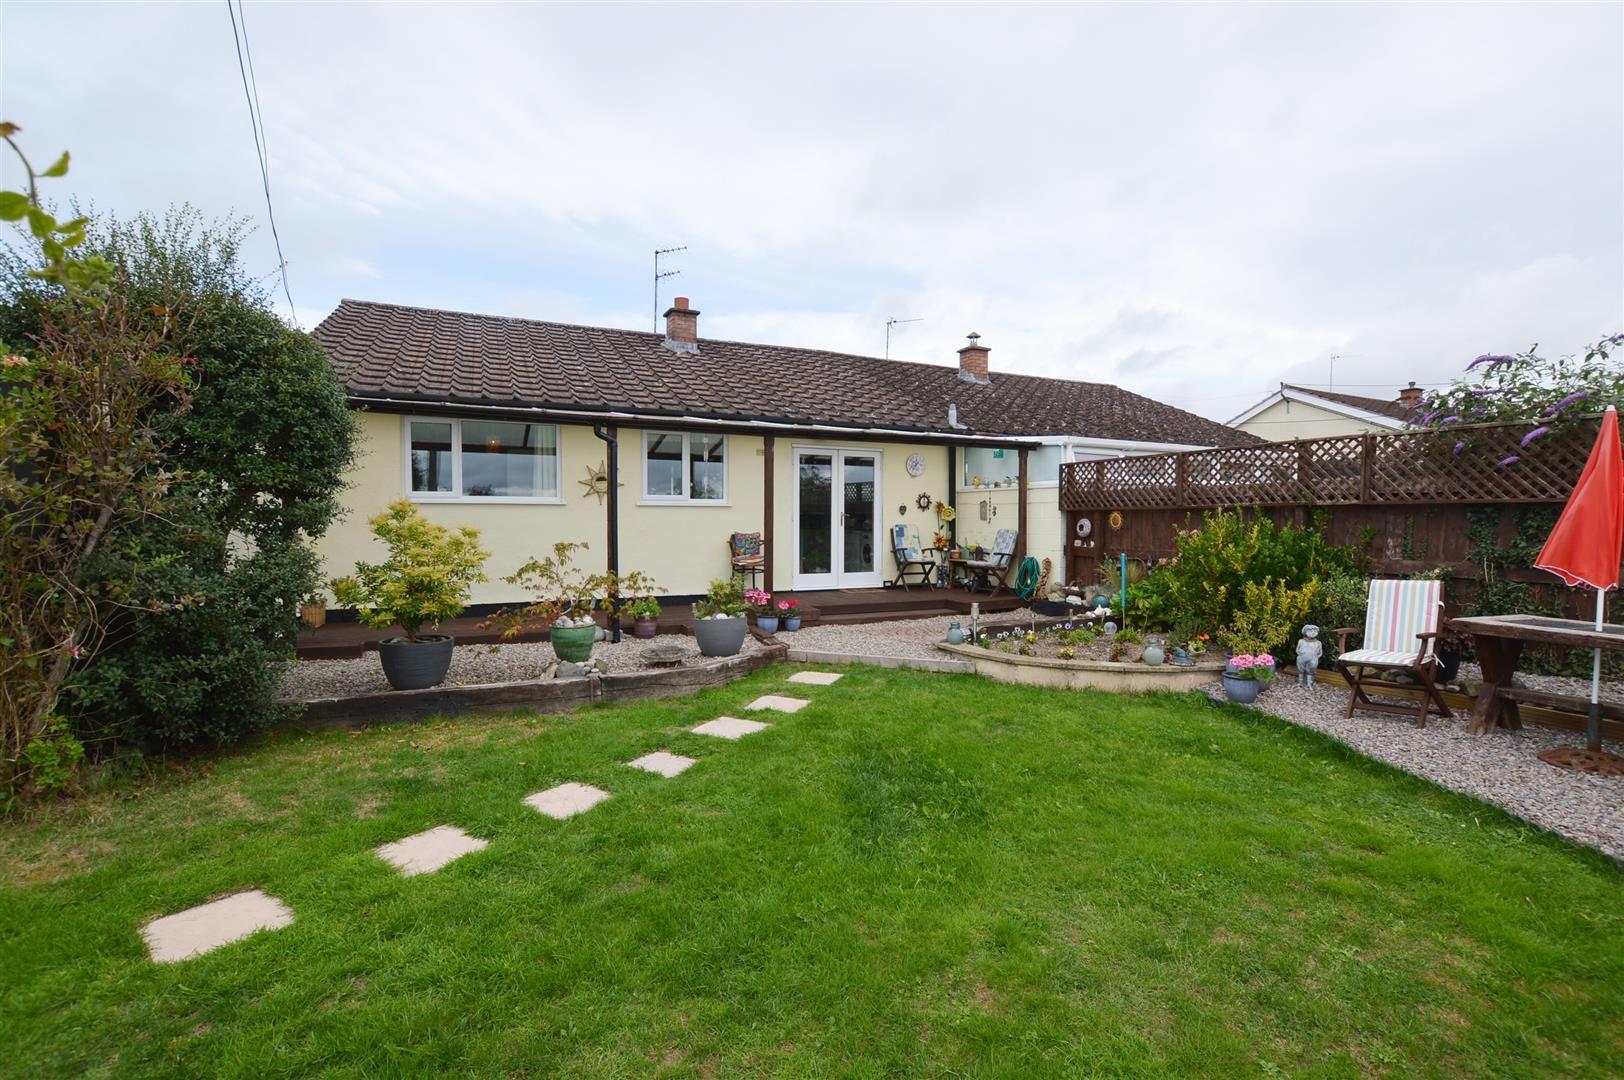 3 bed semi-detached-bungalow for sale in Shobdon 9